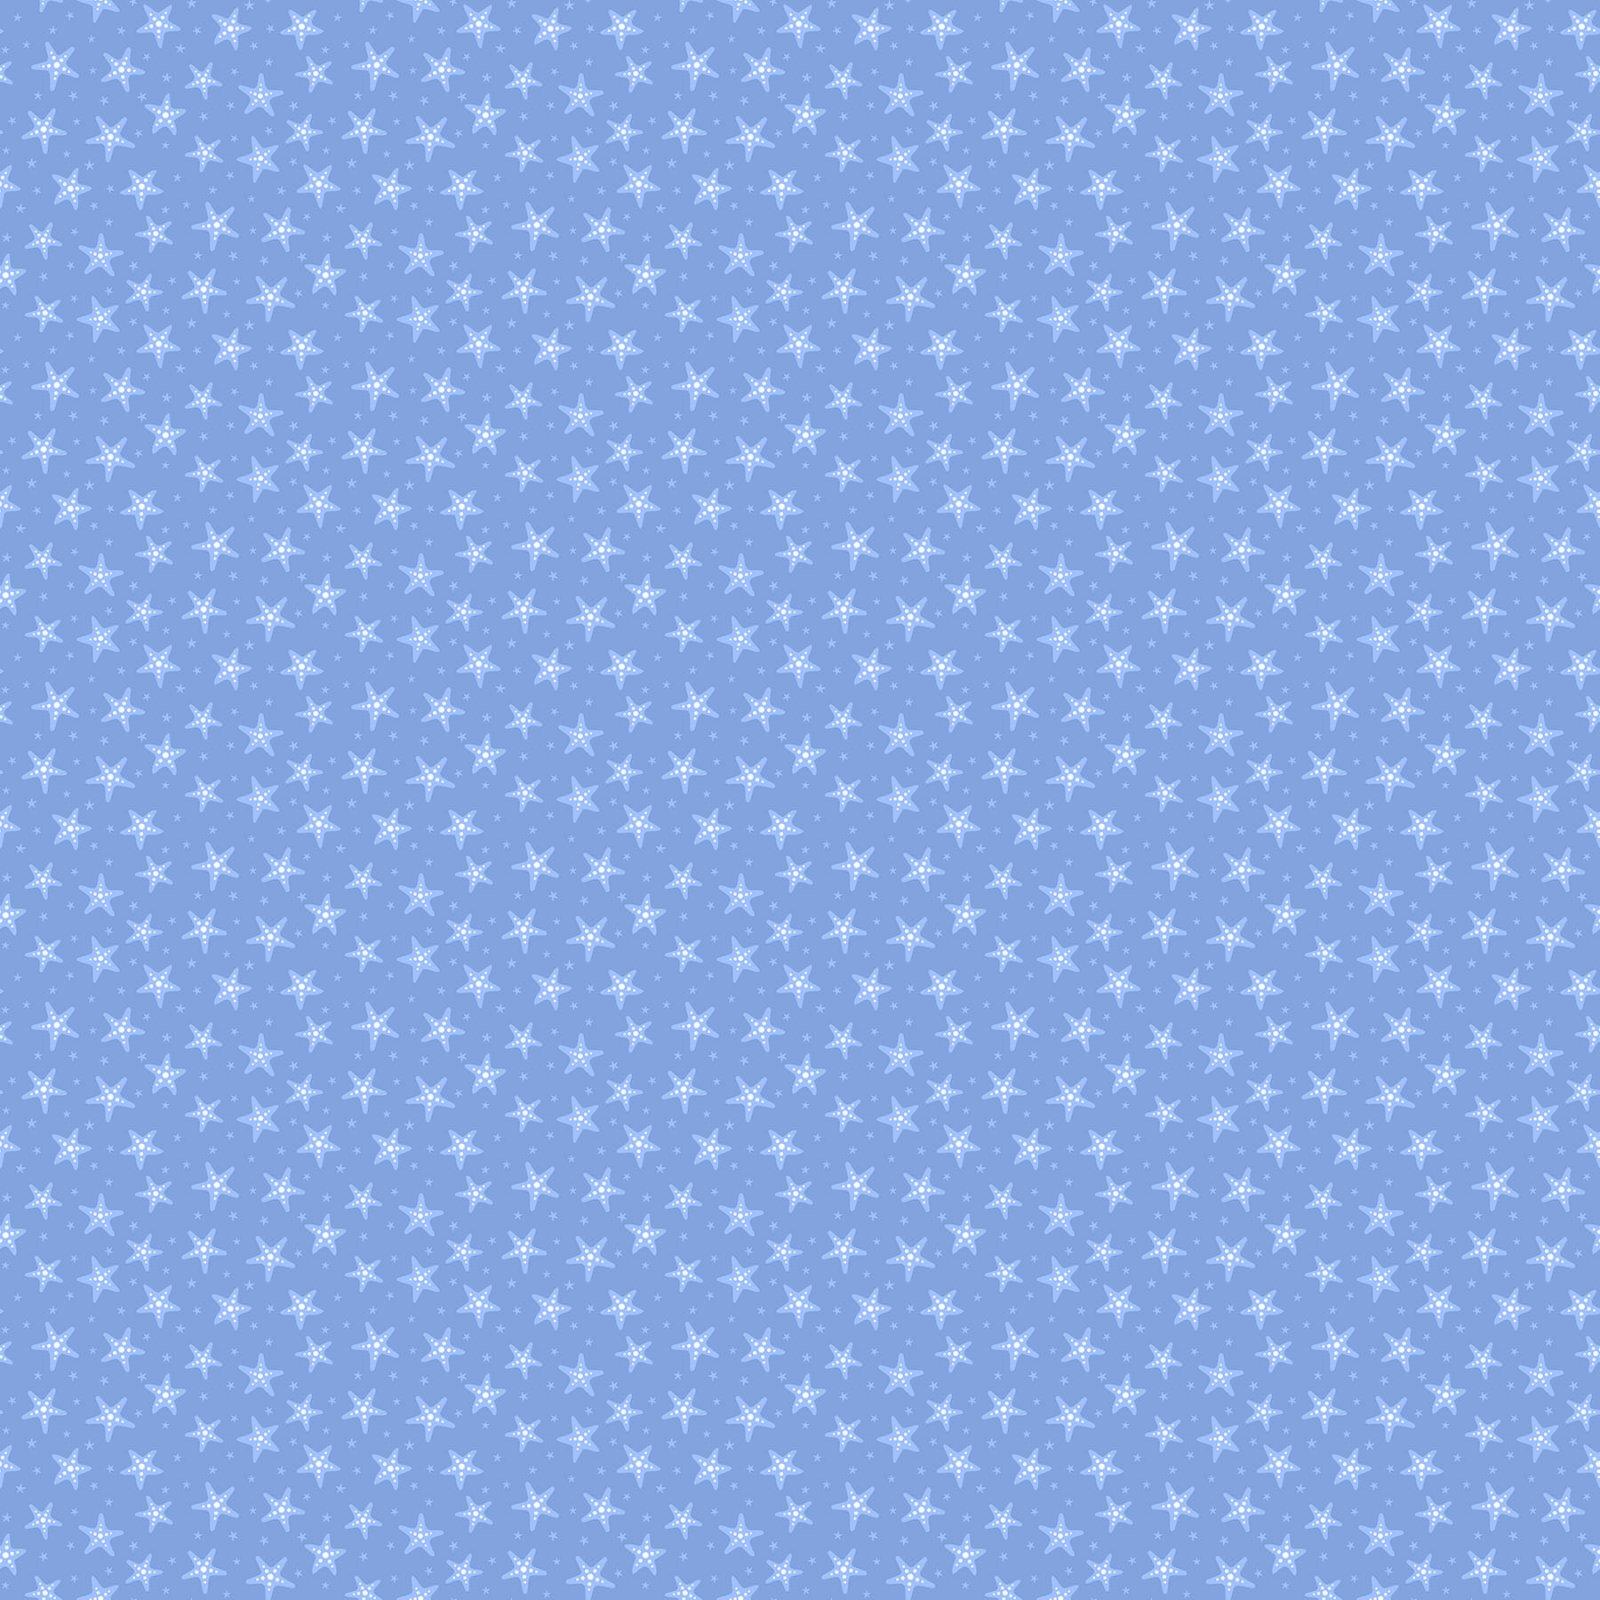 Mermaid Kitties Dk Blue Starfish